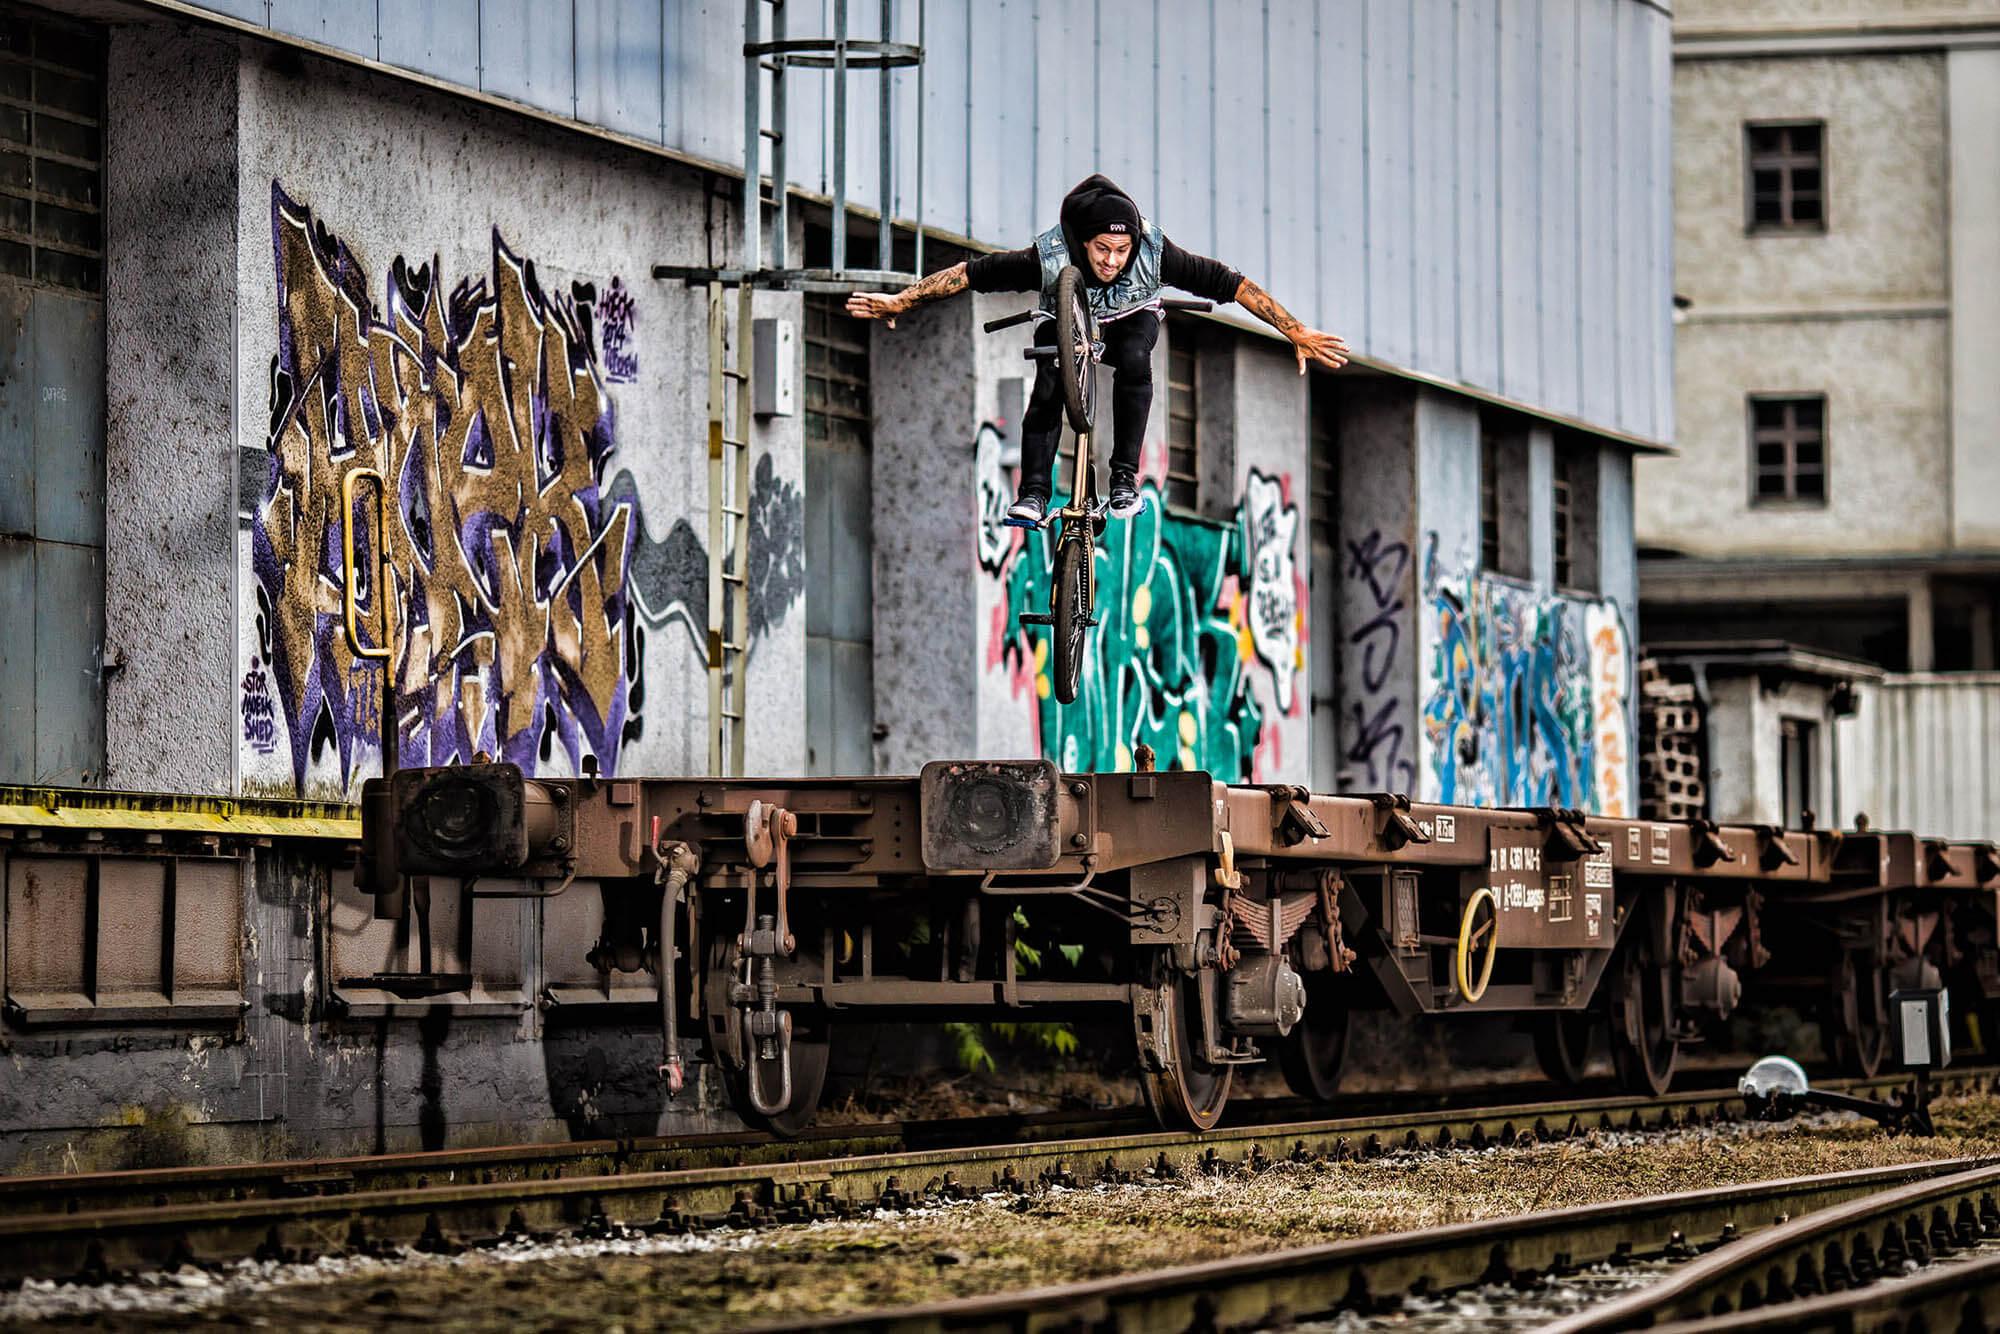 bmx freestyle bike freight train nohander action sports photography sportfotografie flap photography fotograf philipp greindl photographer linz austria